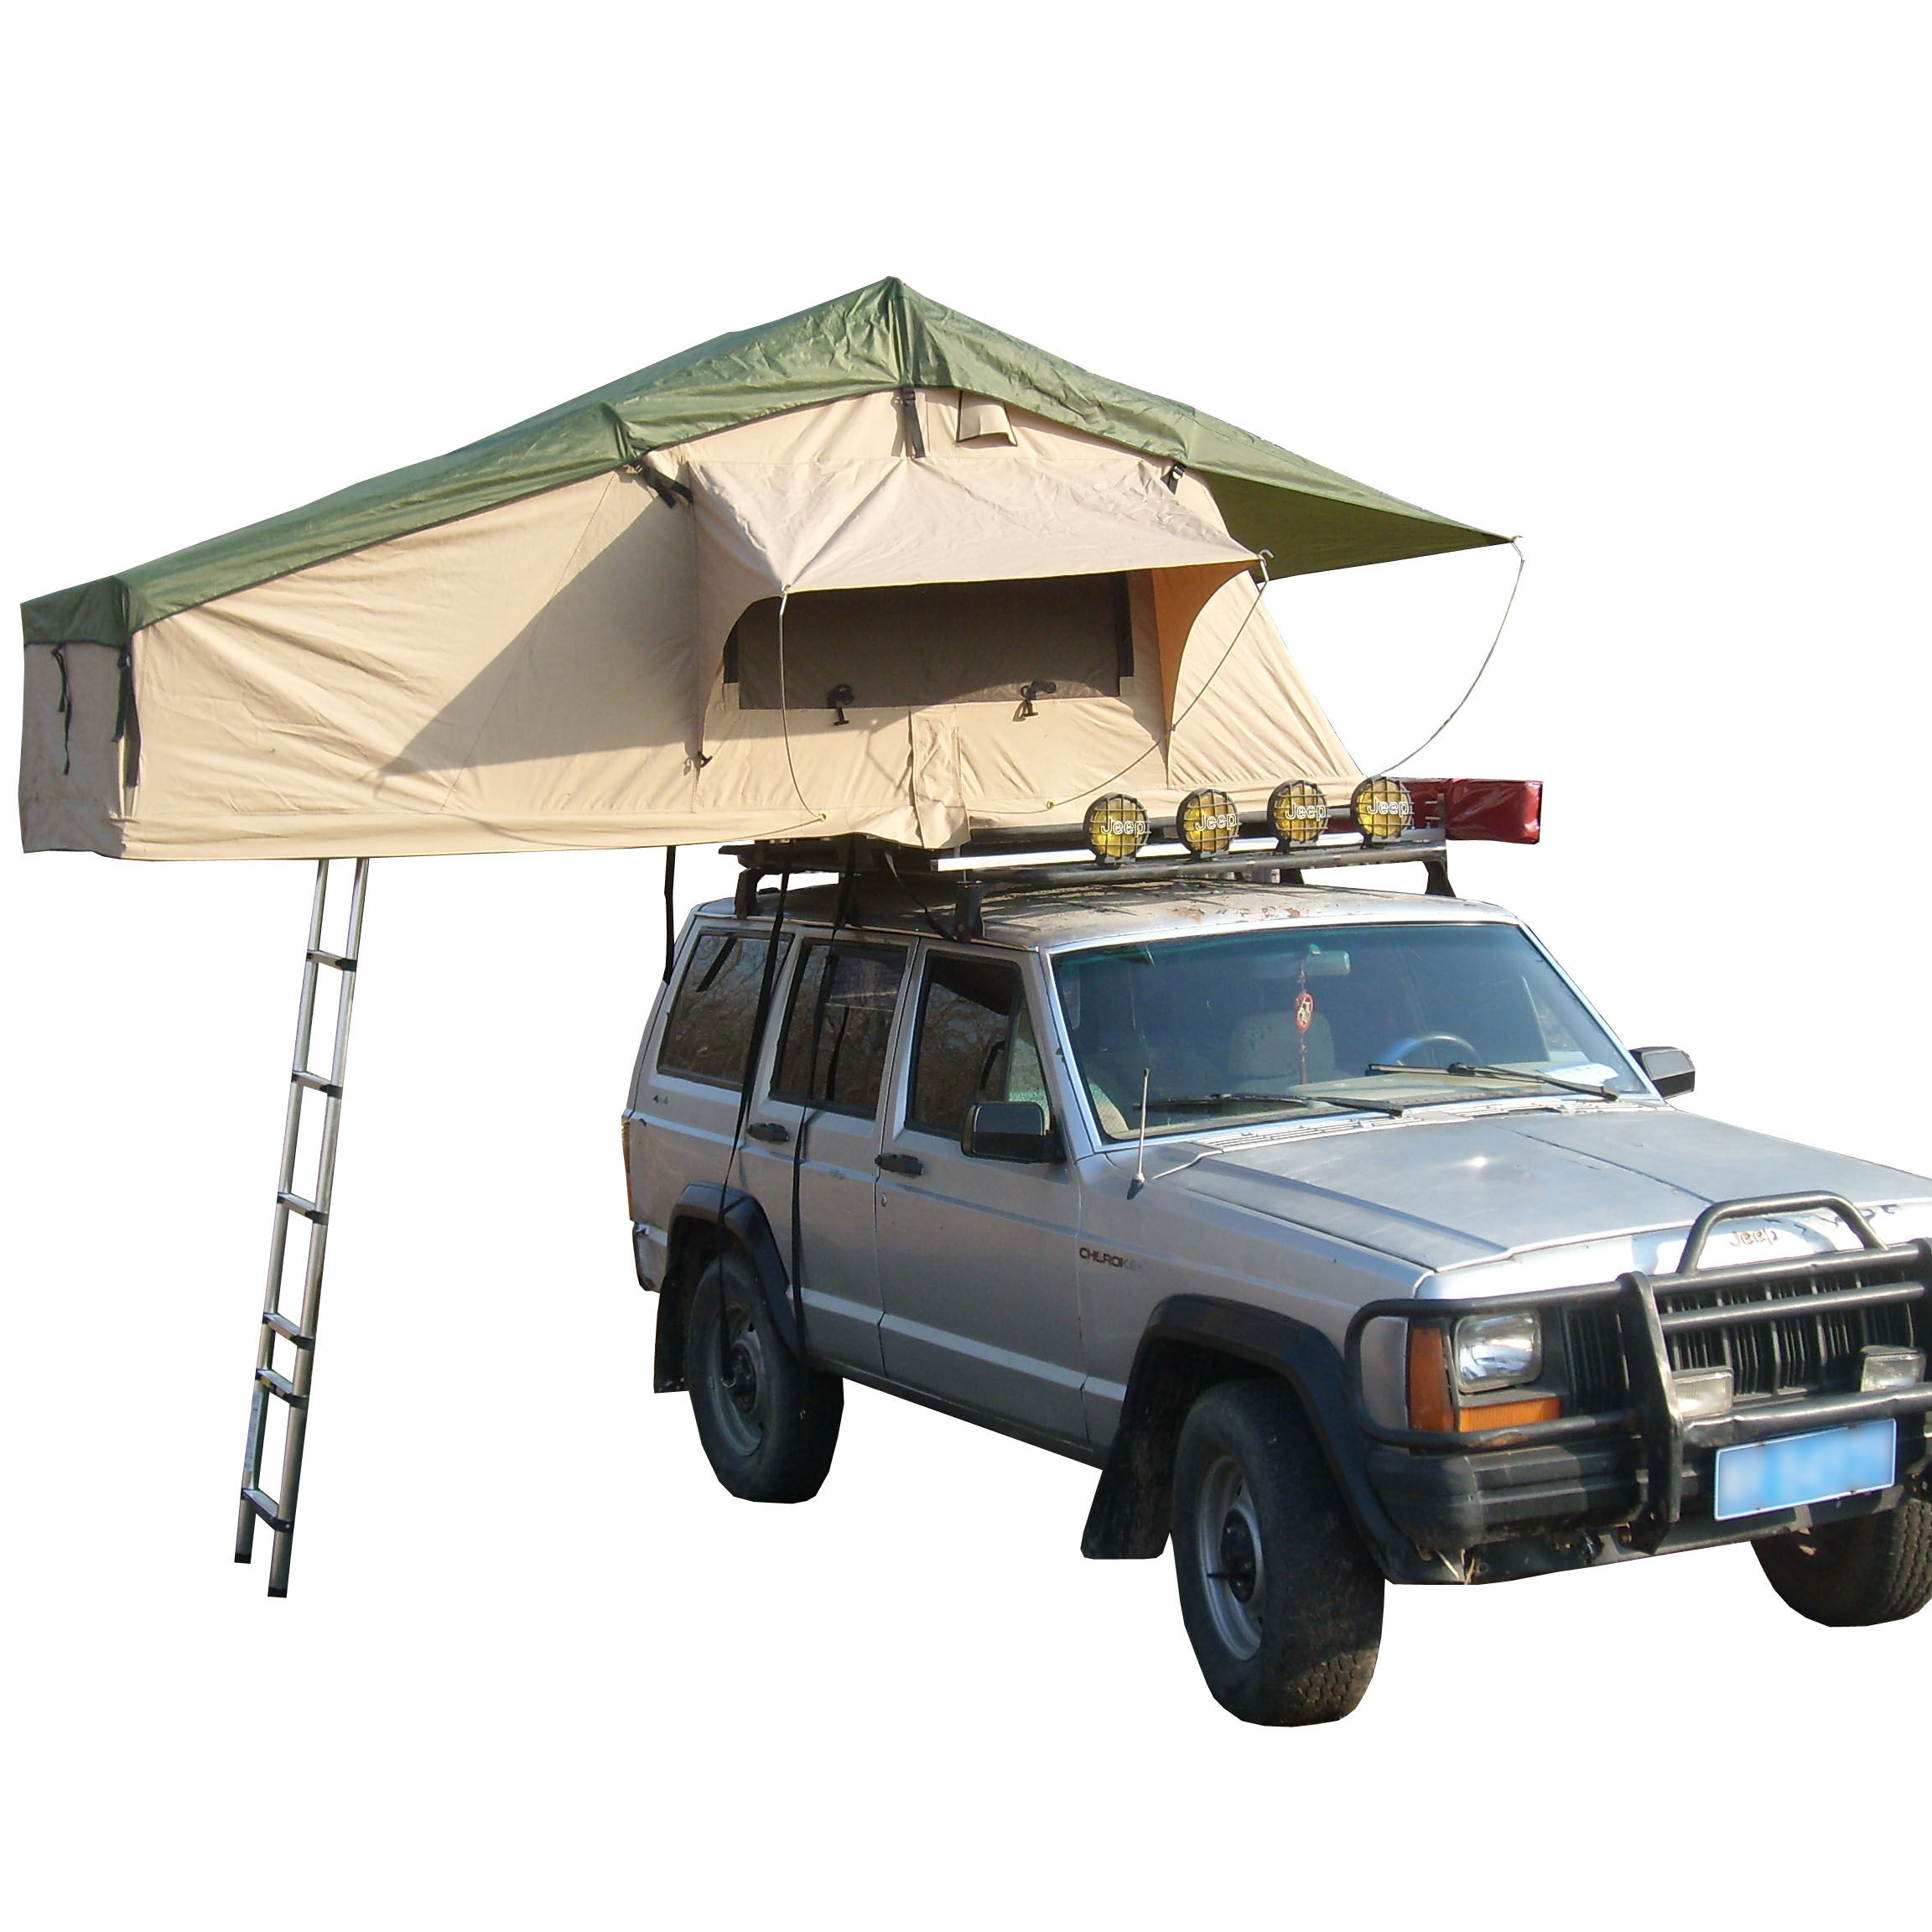 Overland Trailer GreenBeigeKhaki Car Roof Top TentCar